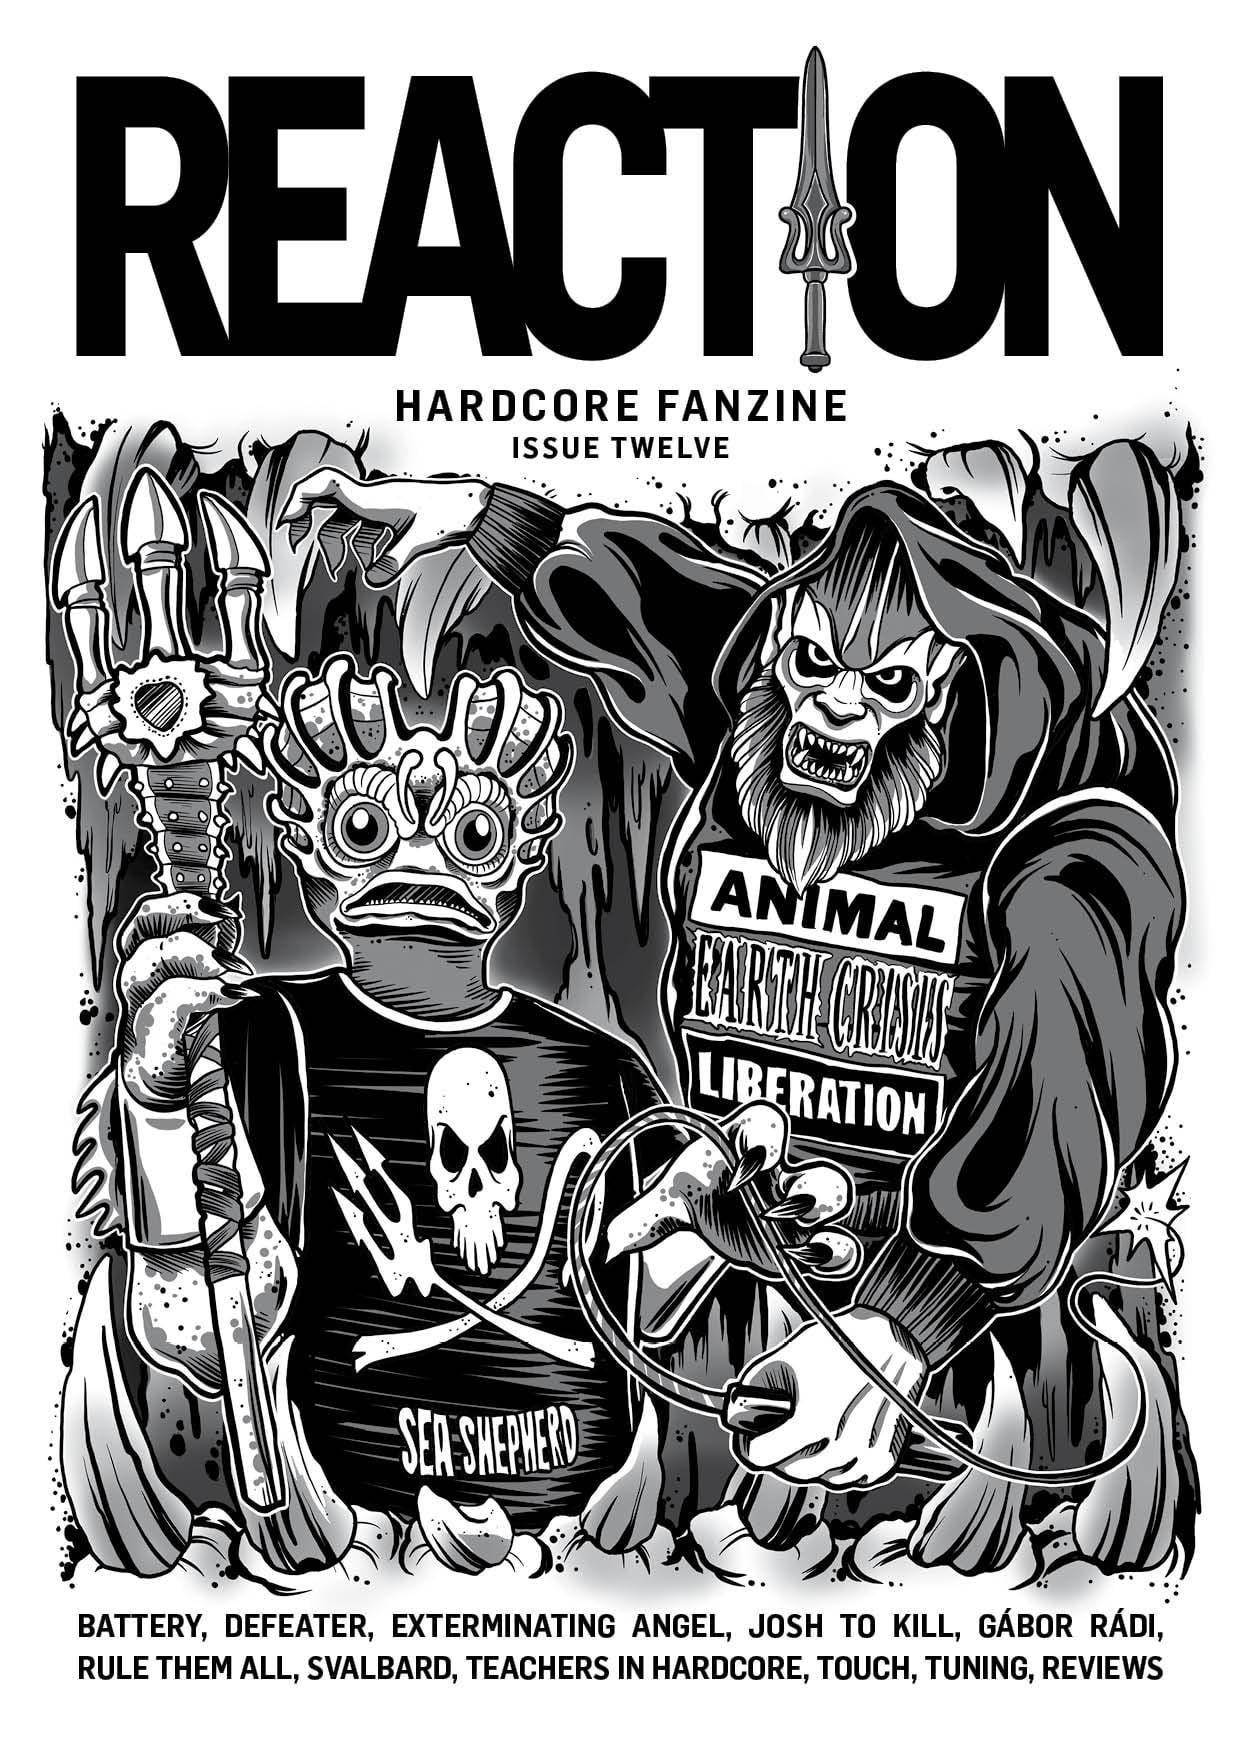 Reaction fanzine #12